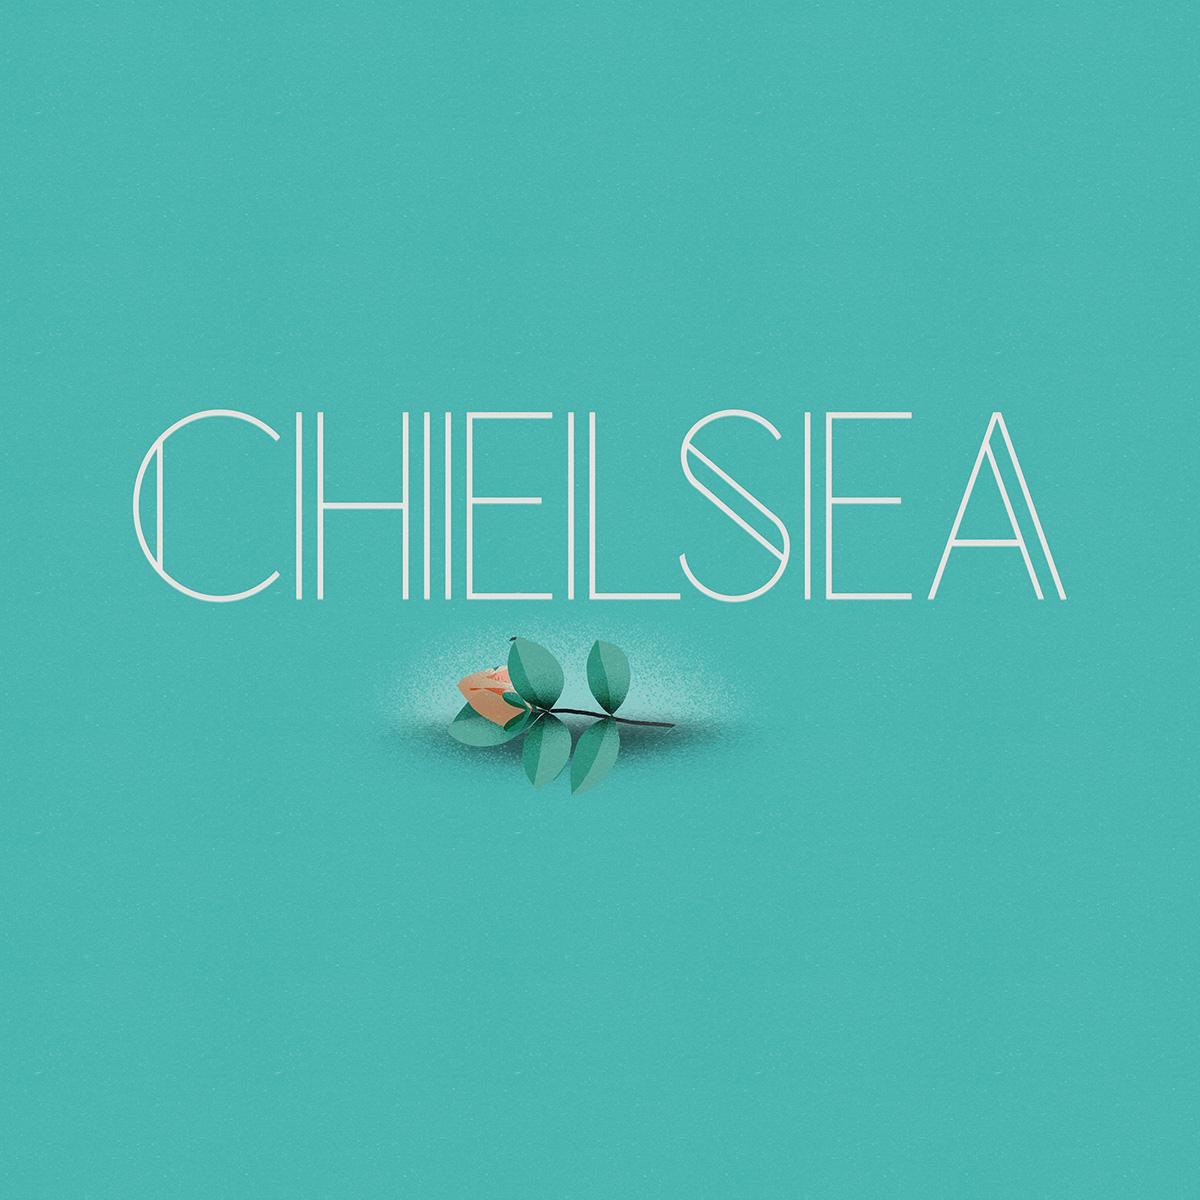 Chelsea Font Download